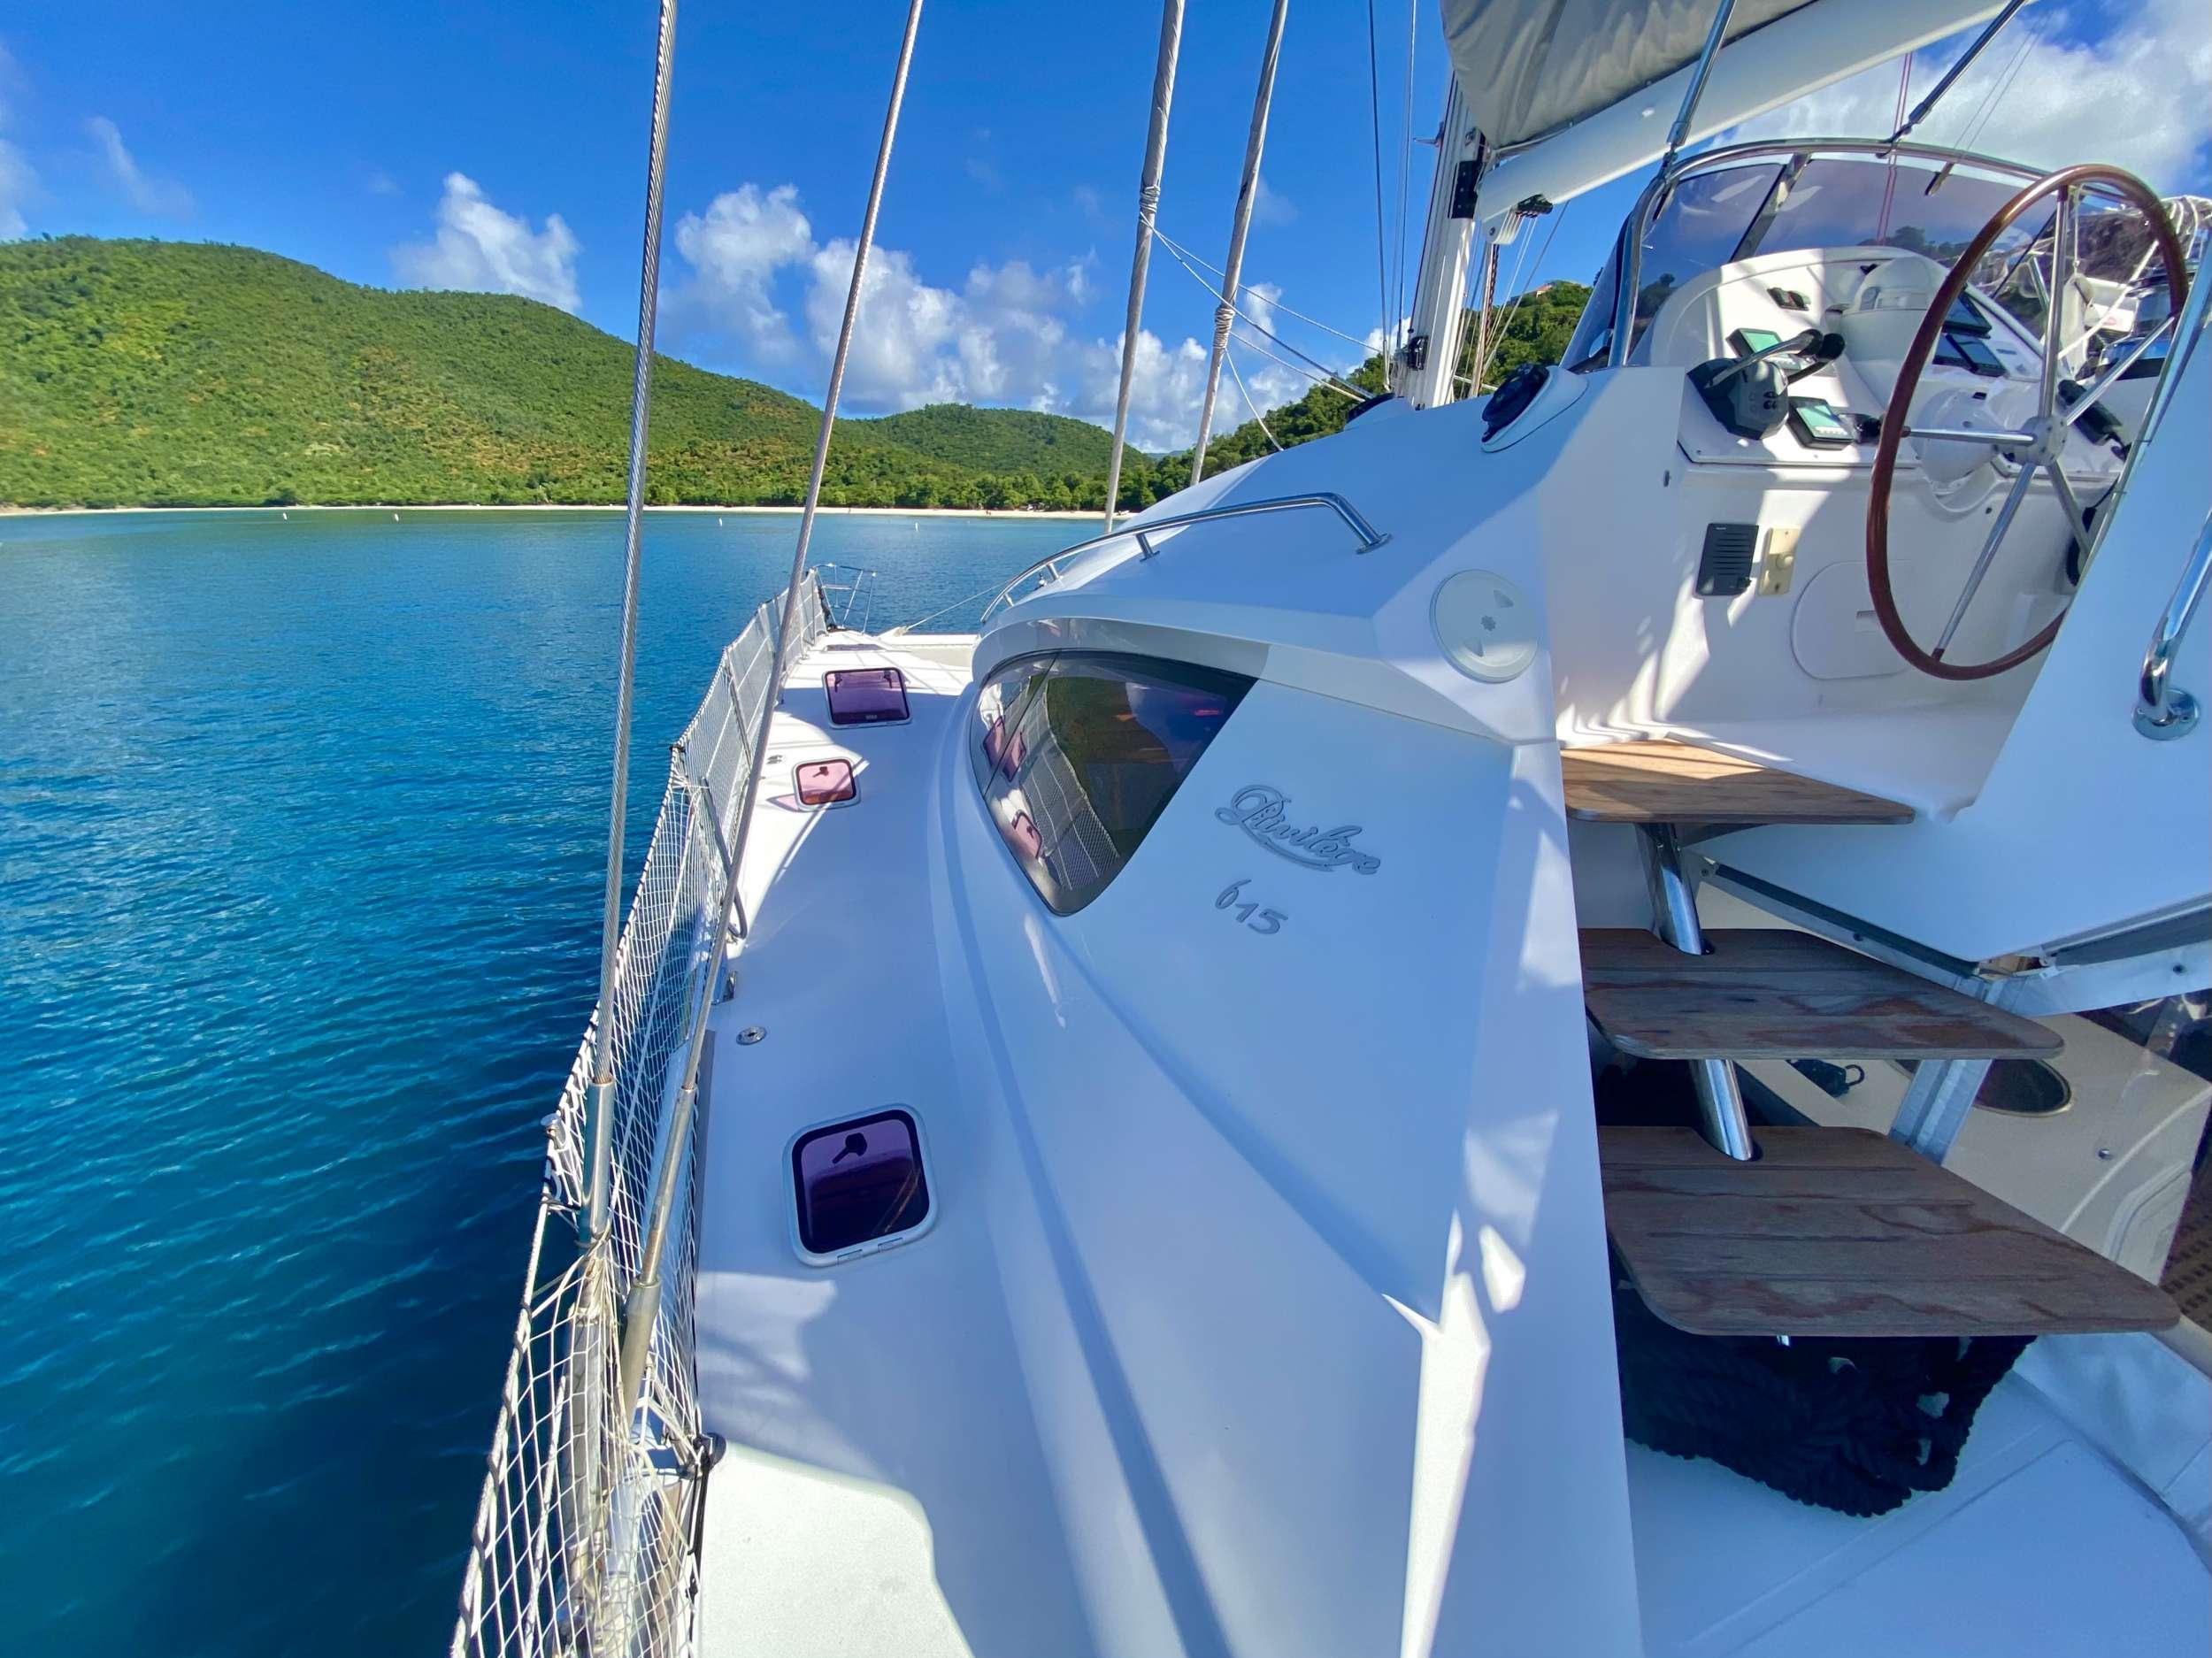 TRES SUENOS yacht image # 17